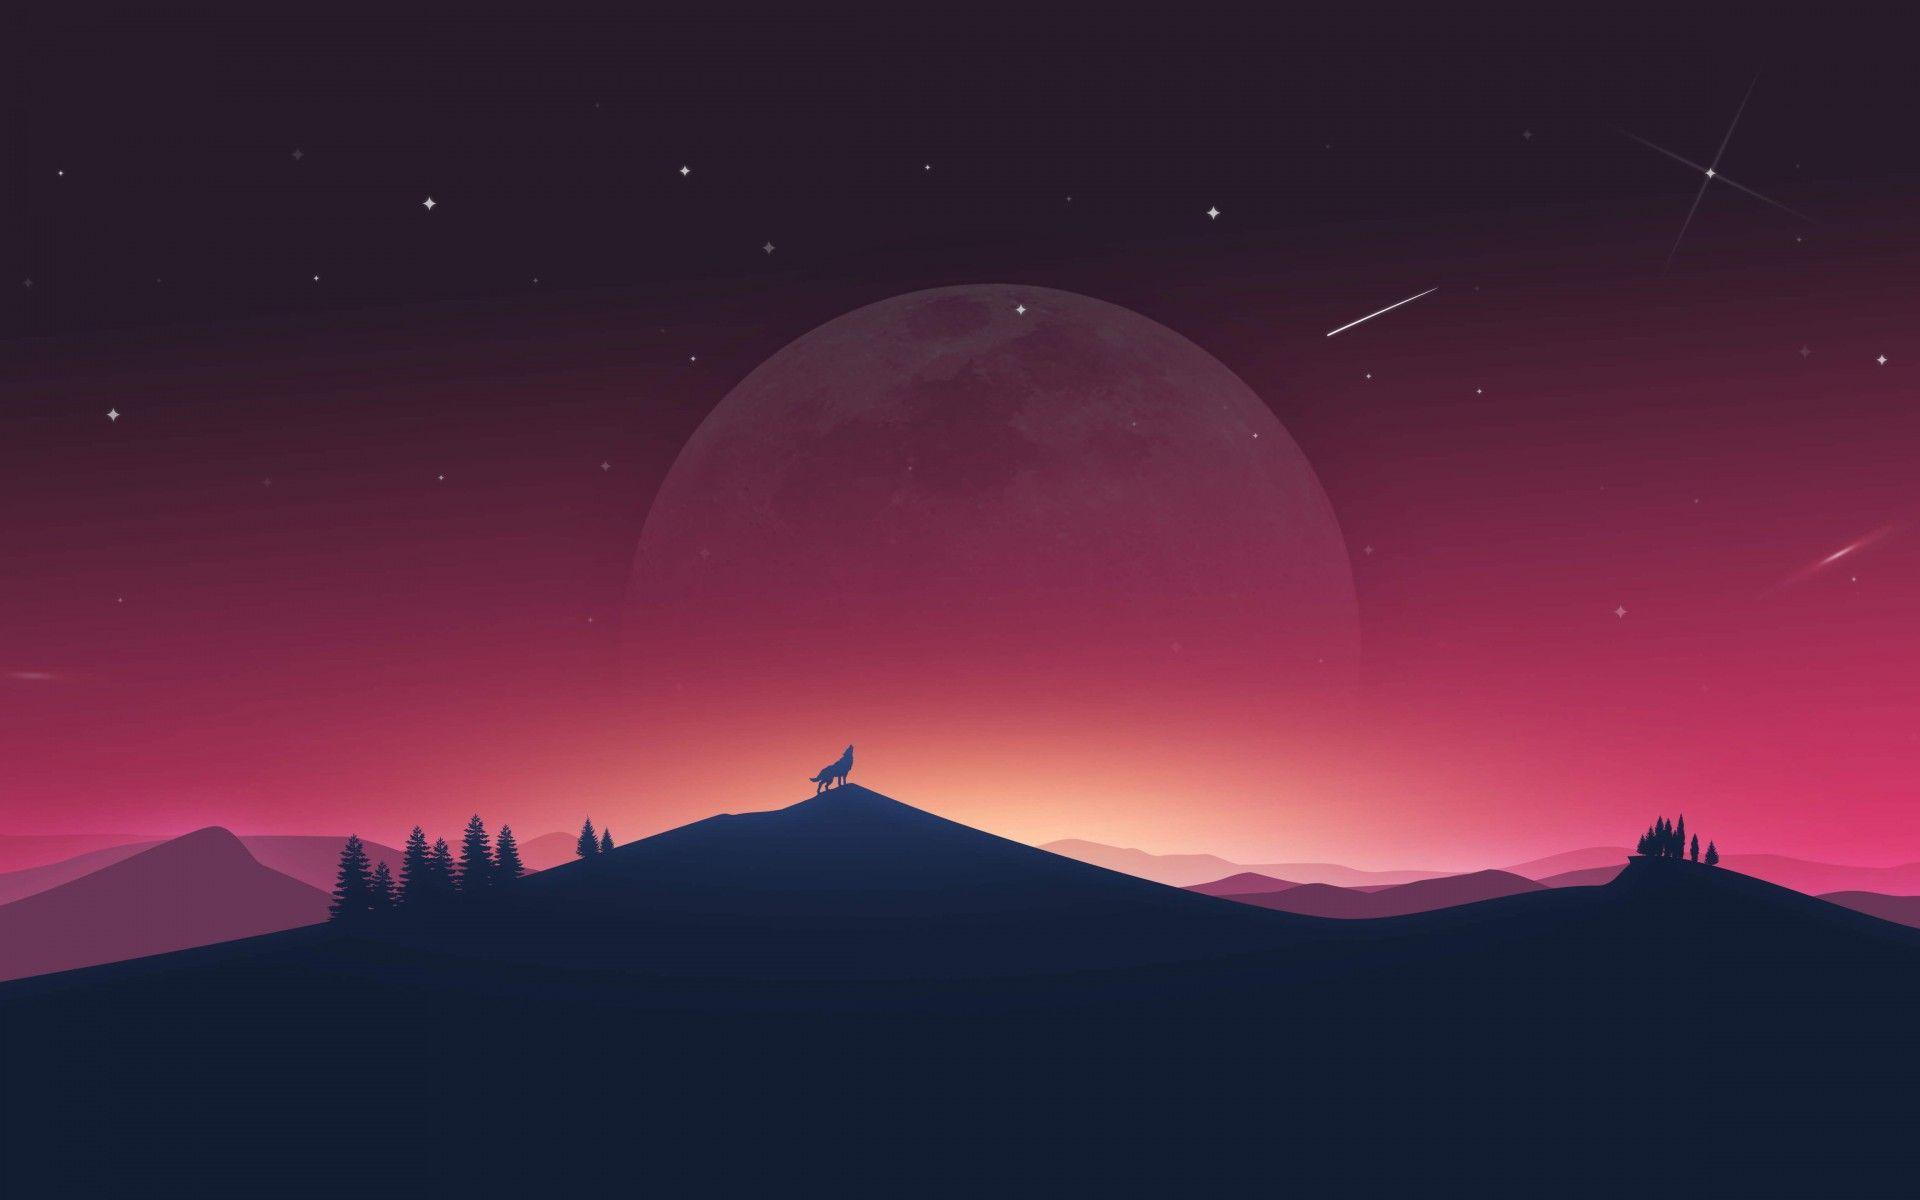 Desktop Background Hd Aesthetic